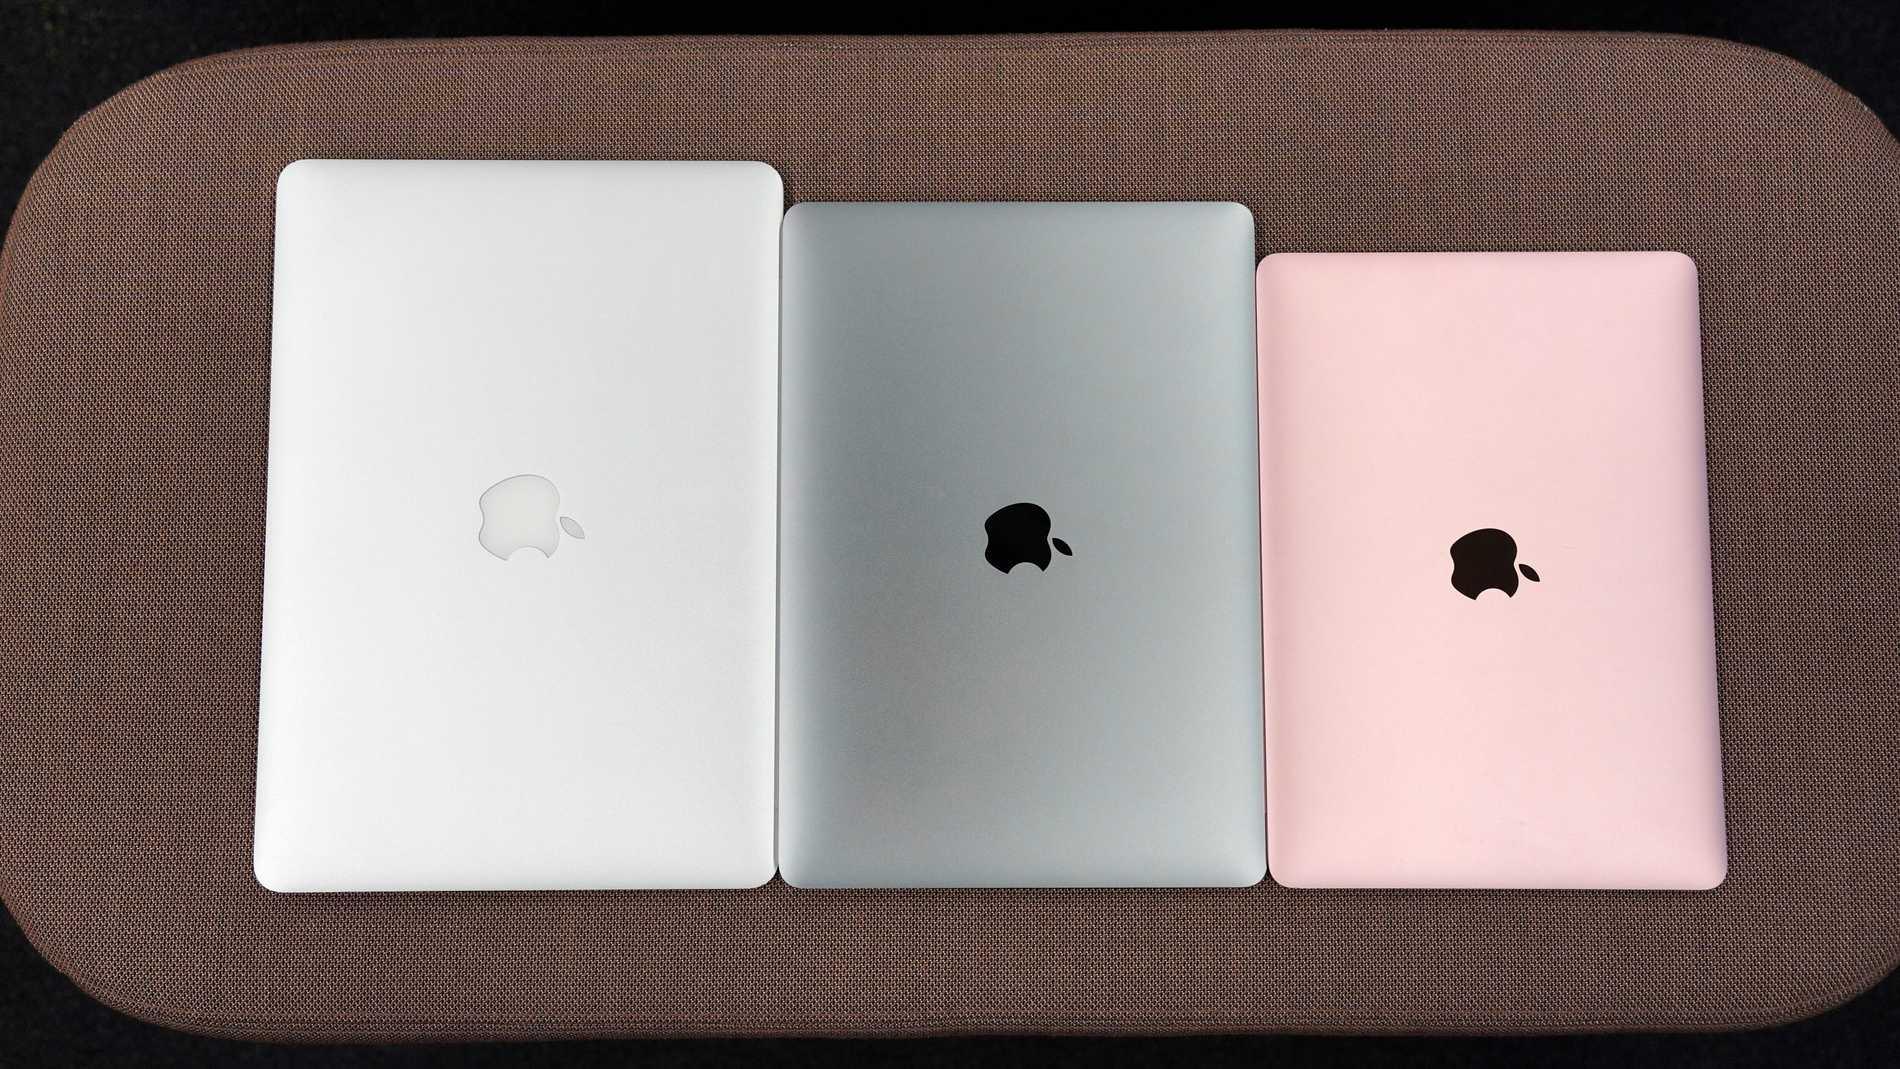 Gamla Macbook Air 13, nya Macbook Air 13 och Macbook 12.